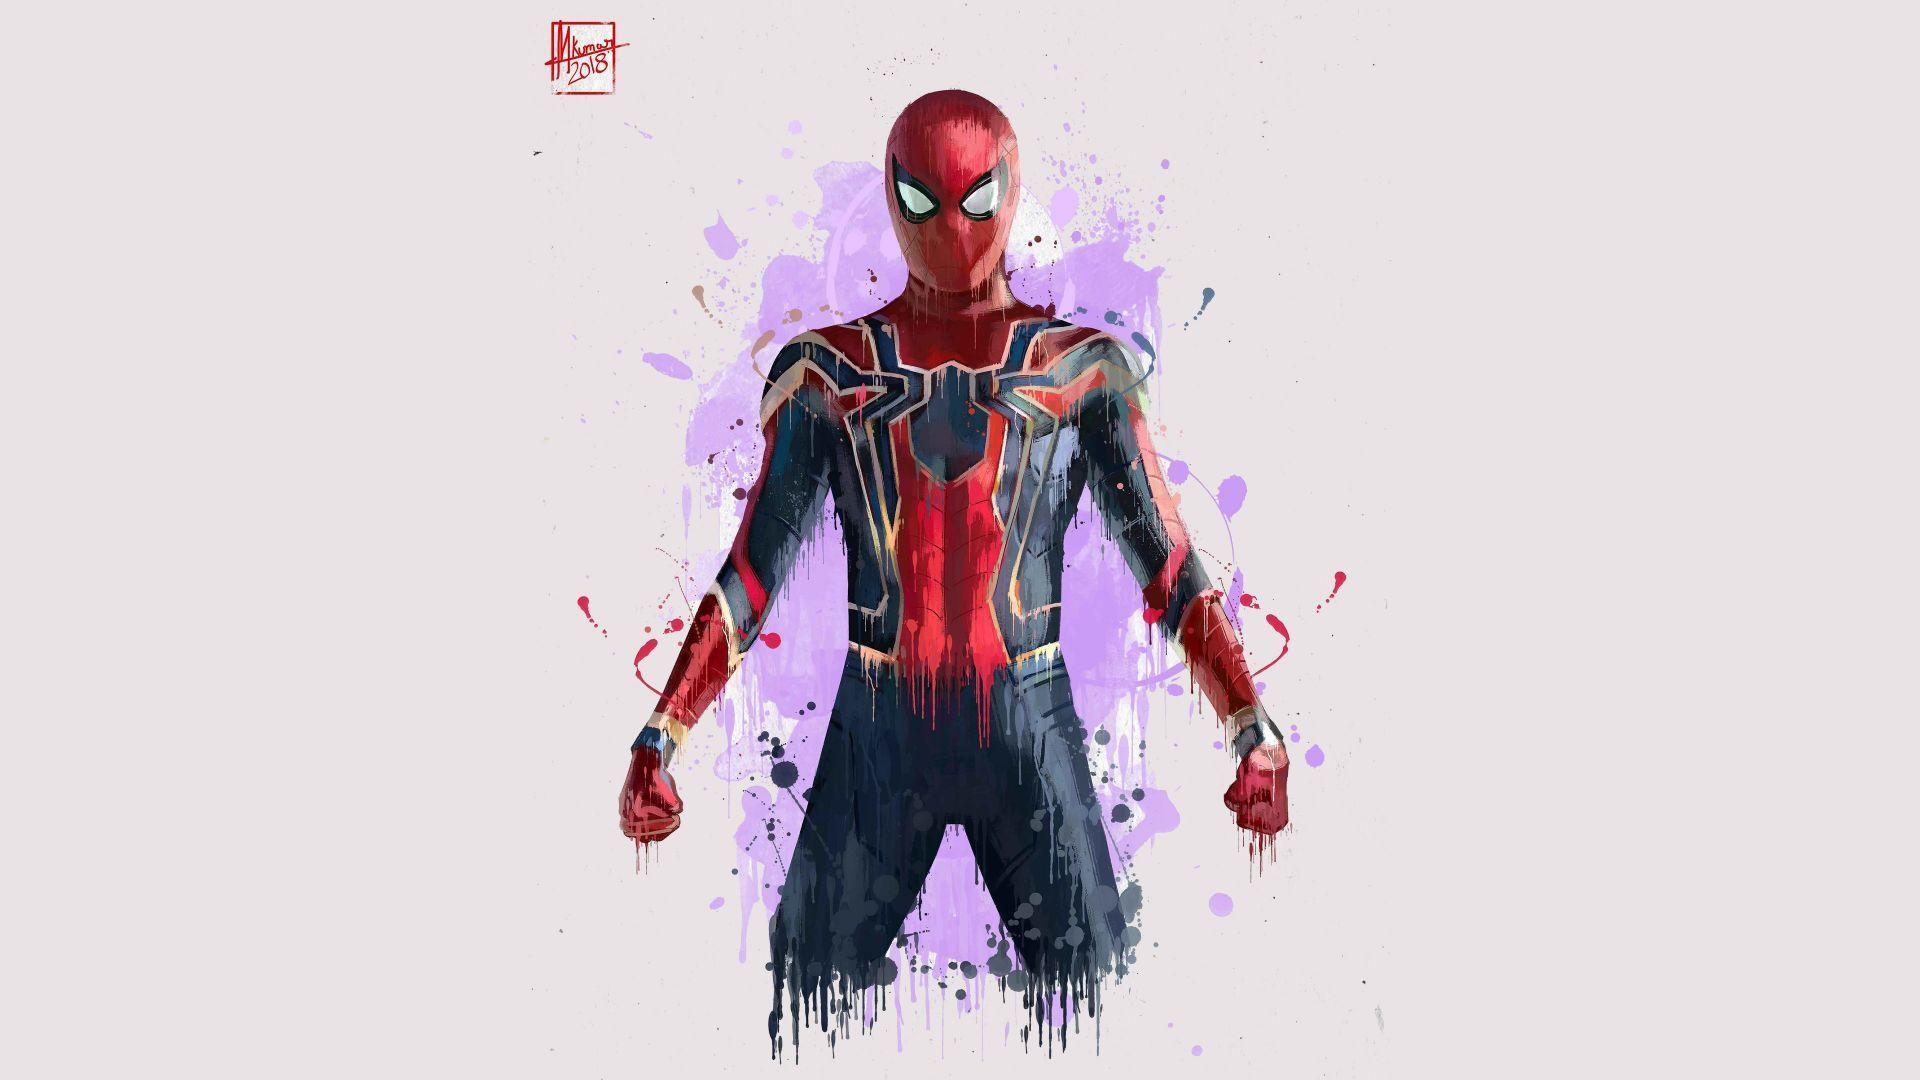 Download Wallpapers Of Iron Spider Spider Man Avengers Infinity War Artwork 4k Creative Graphics 12929 Iron Man Artwork Iron Spider Avengers Wallpaper